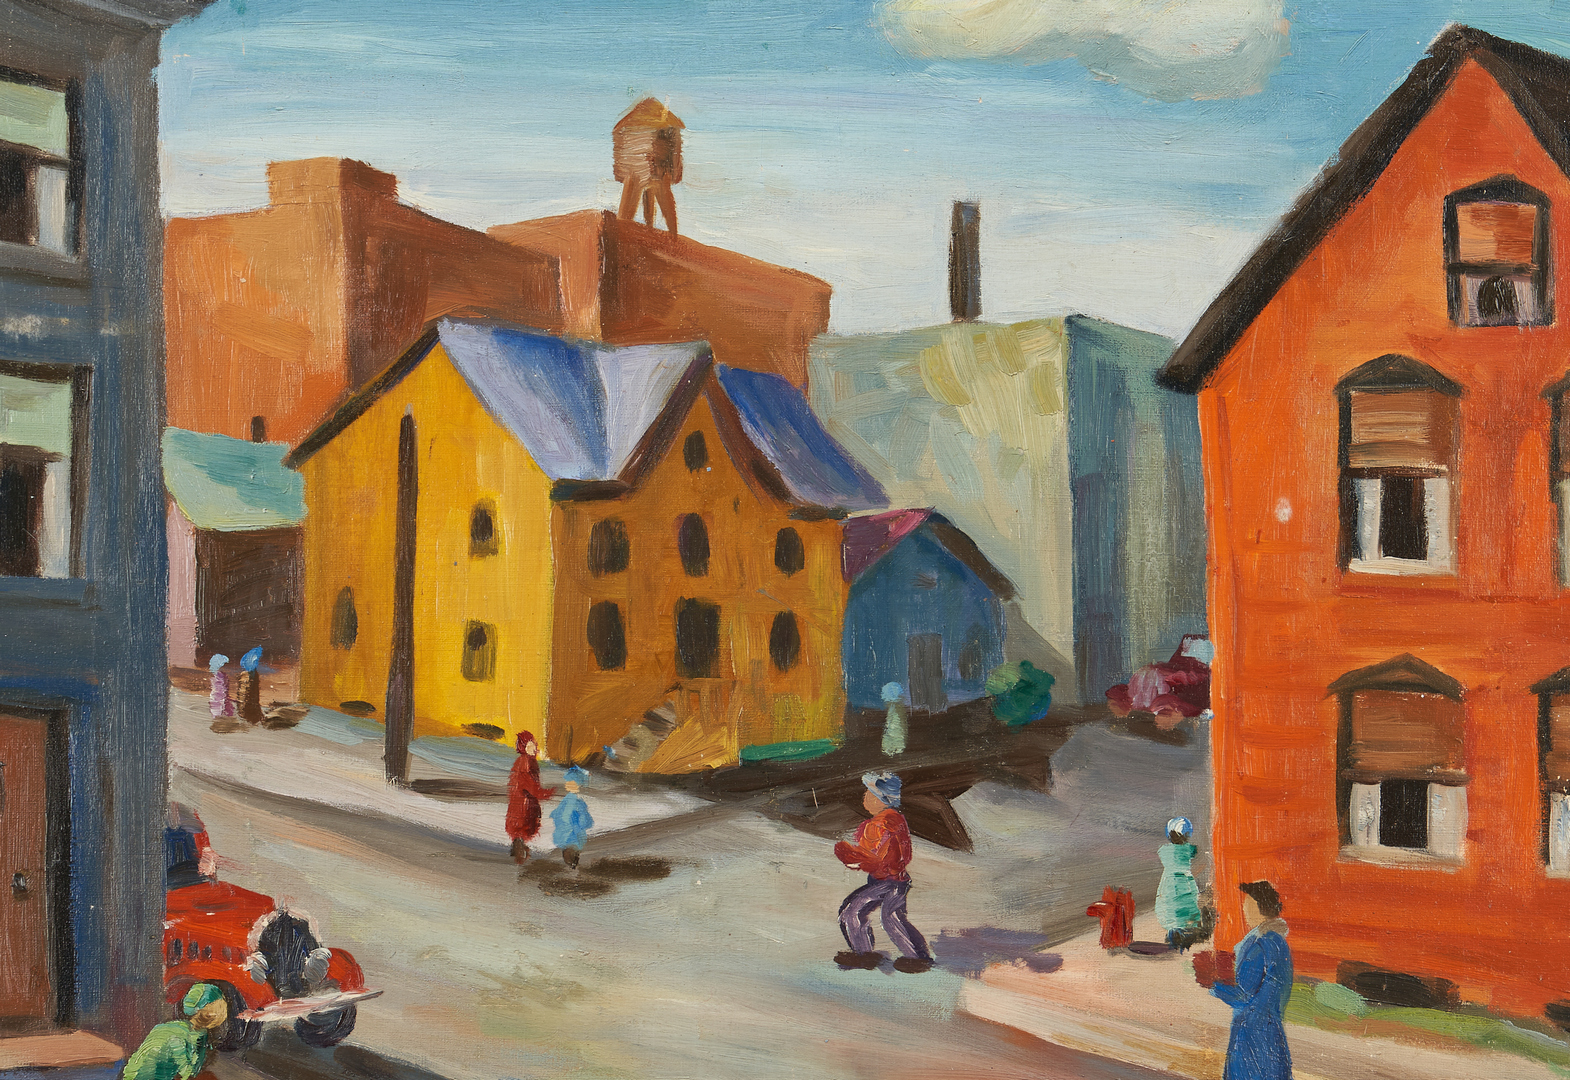 Lot 1140: Midwestern School O/C Painting, City Scene